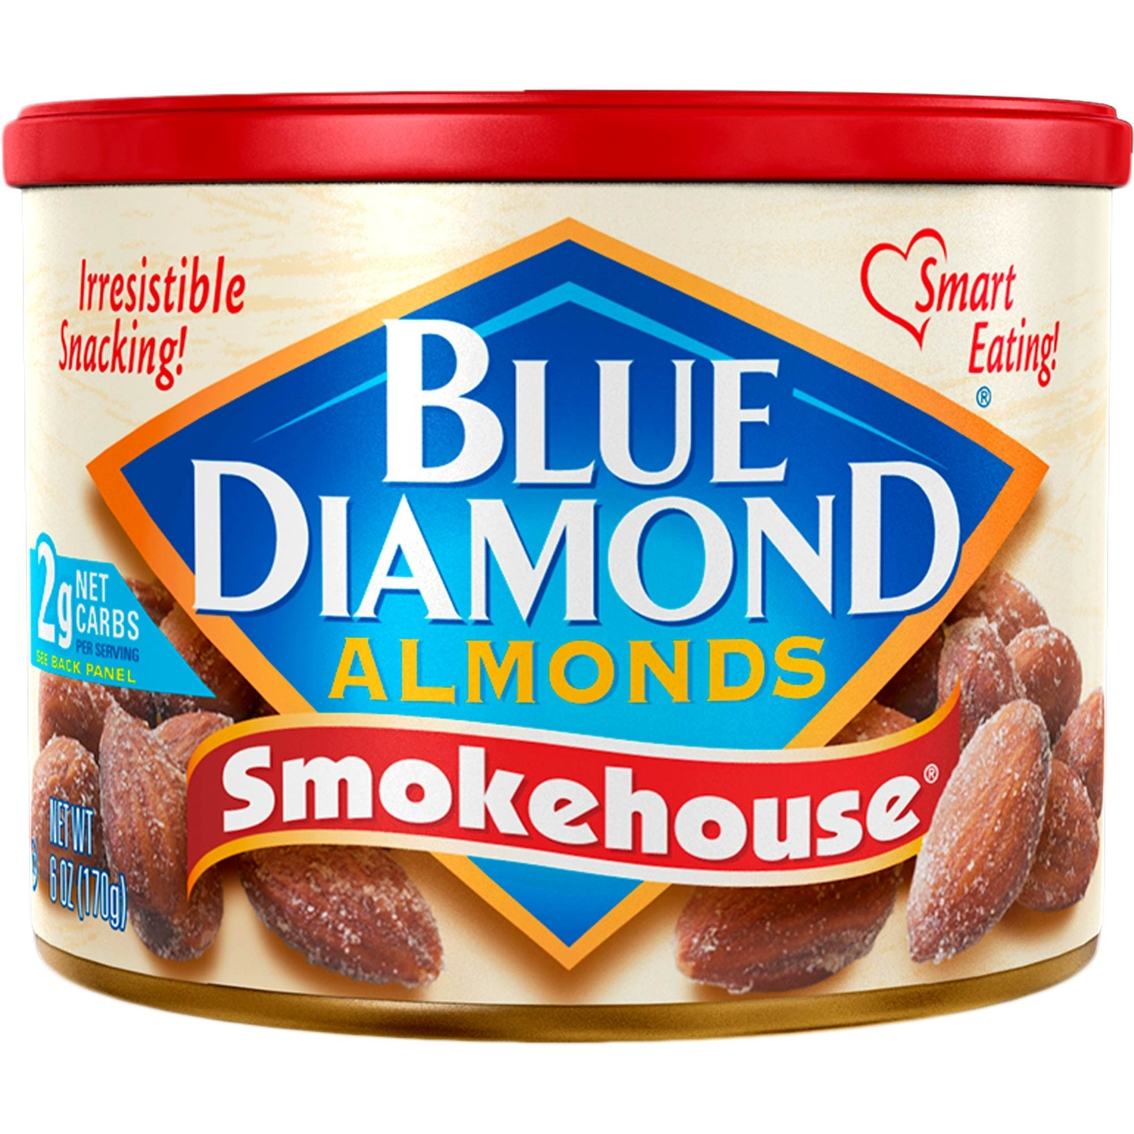 Blue Diamond Almonds Smokehouse 6 oz. Can